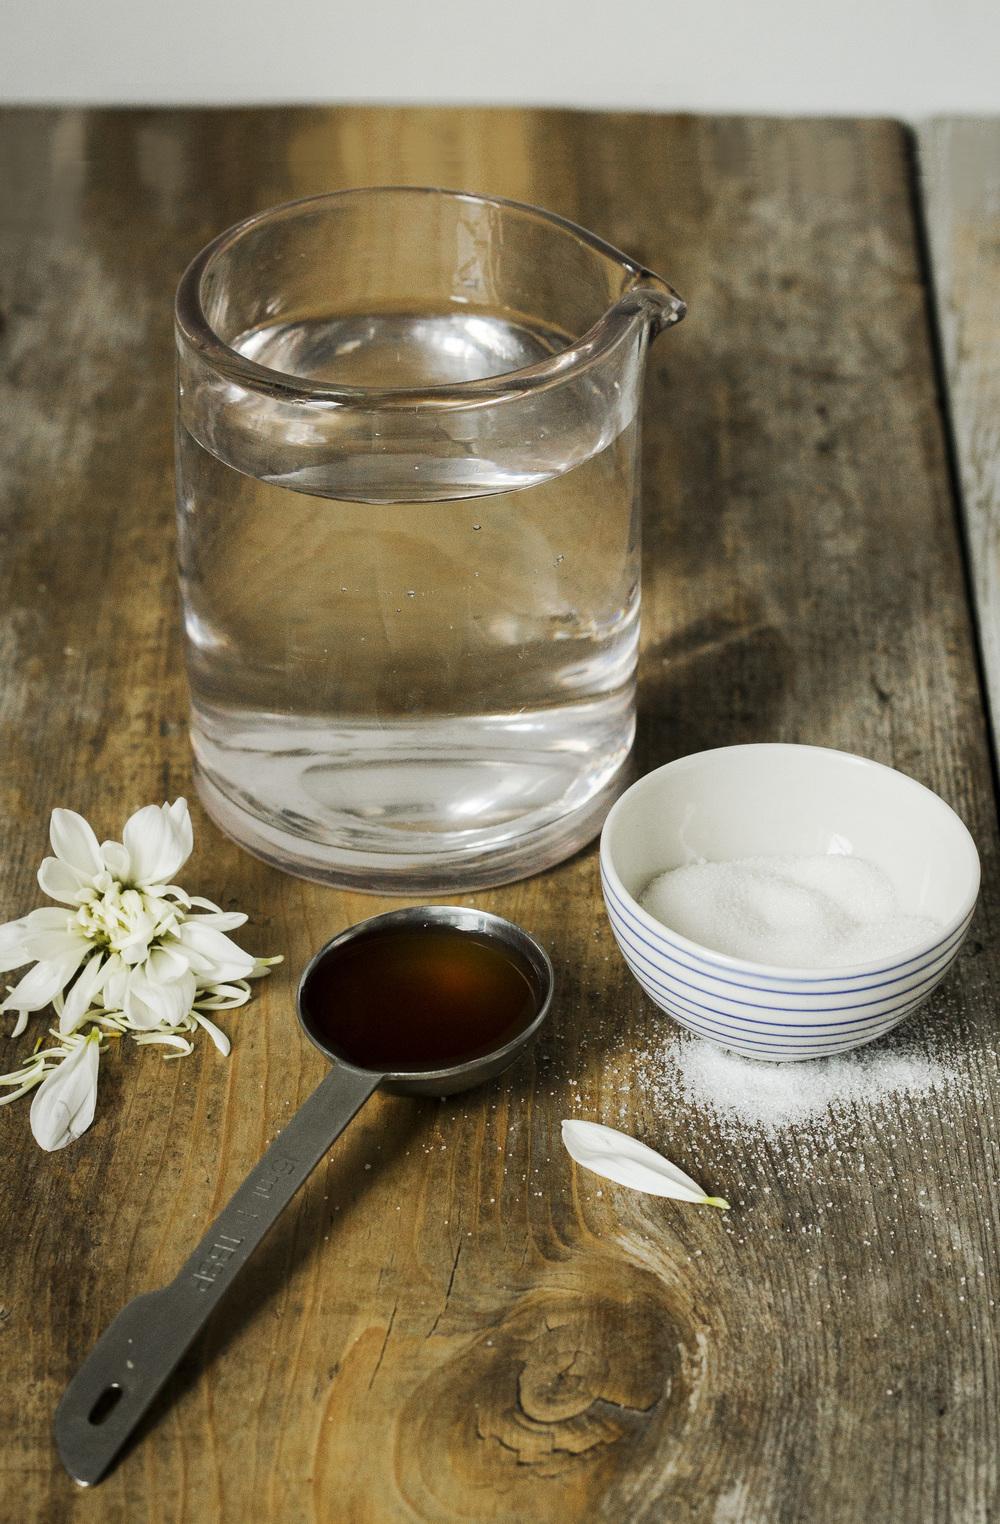 tip for keeping flowers fresher longer | vinegar, sugar, and water elongate the life of cut flowers | via: bekuh b.